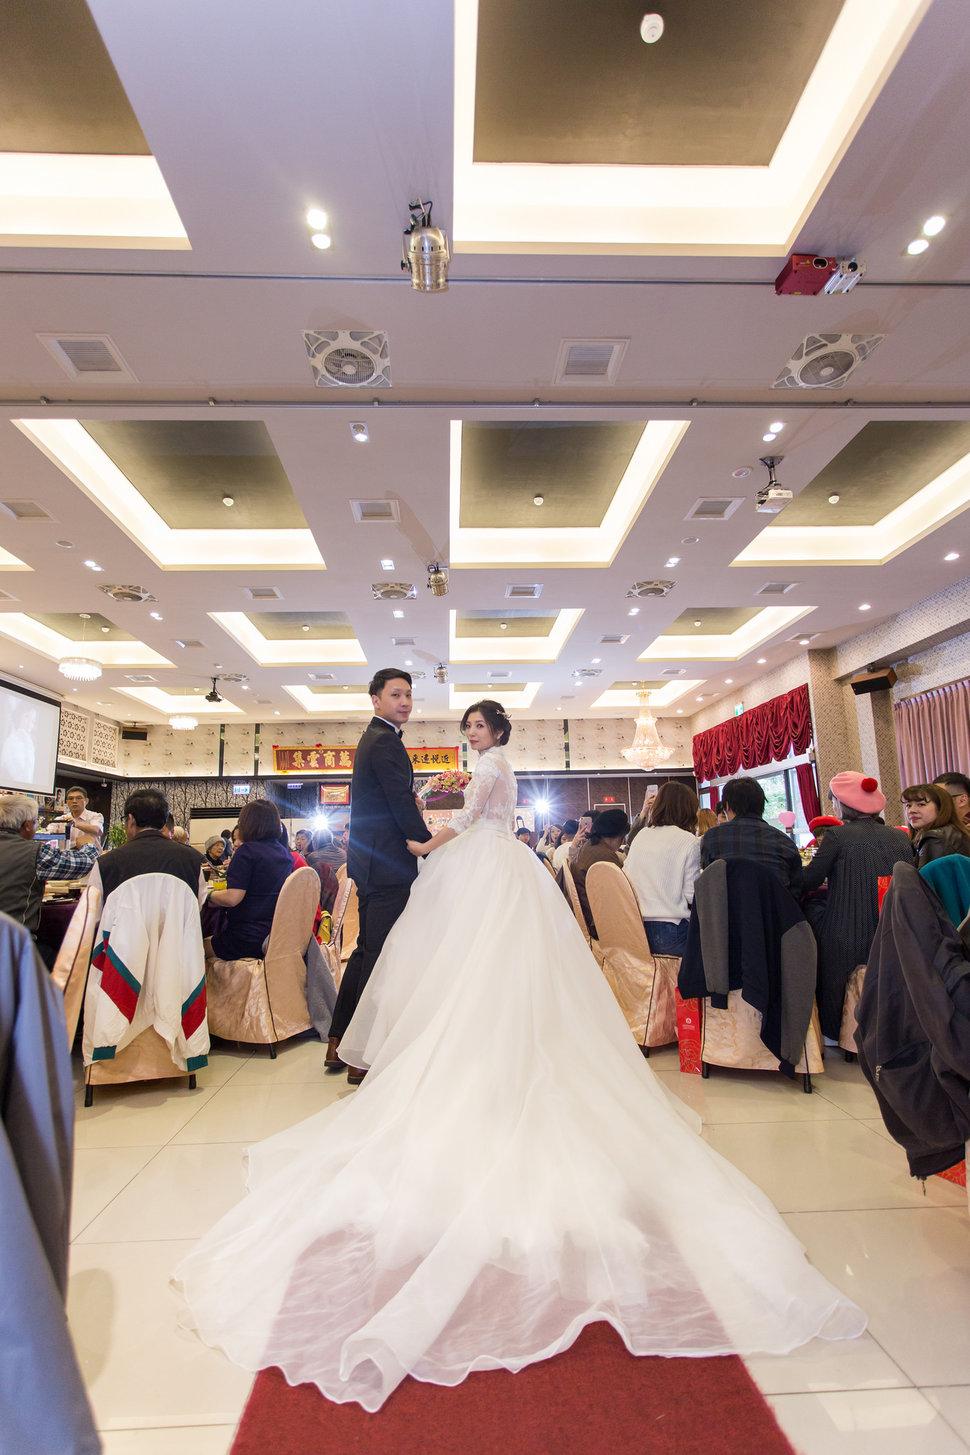 38098083945_3c6545df4e_k - J Photographer《結婚吧》